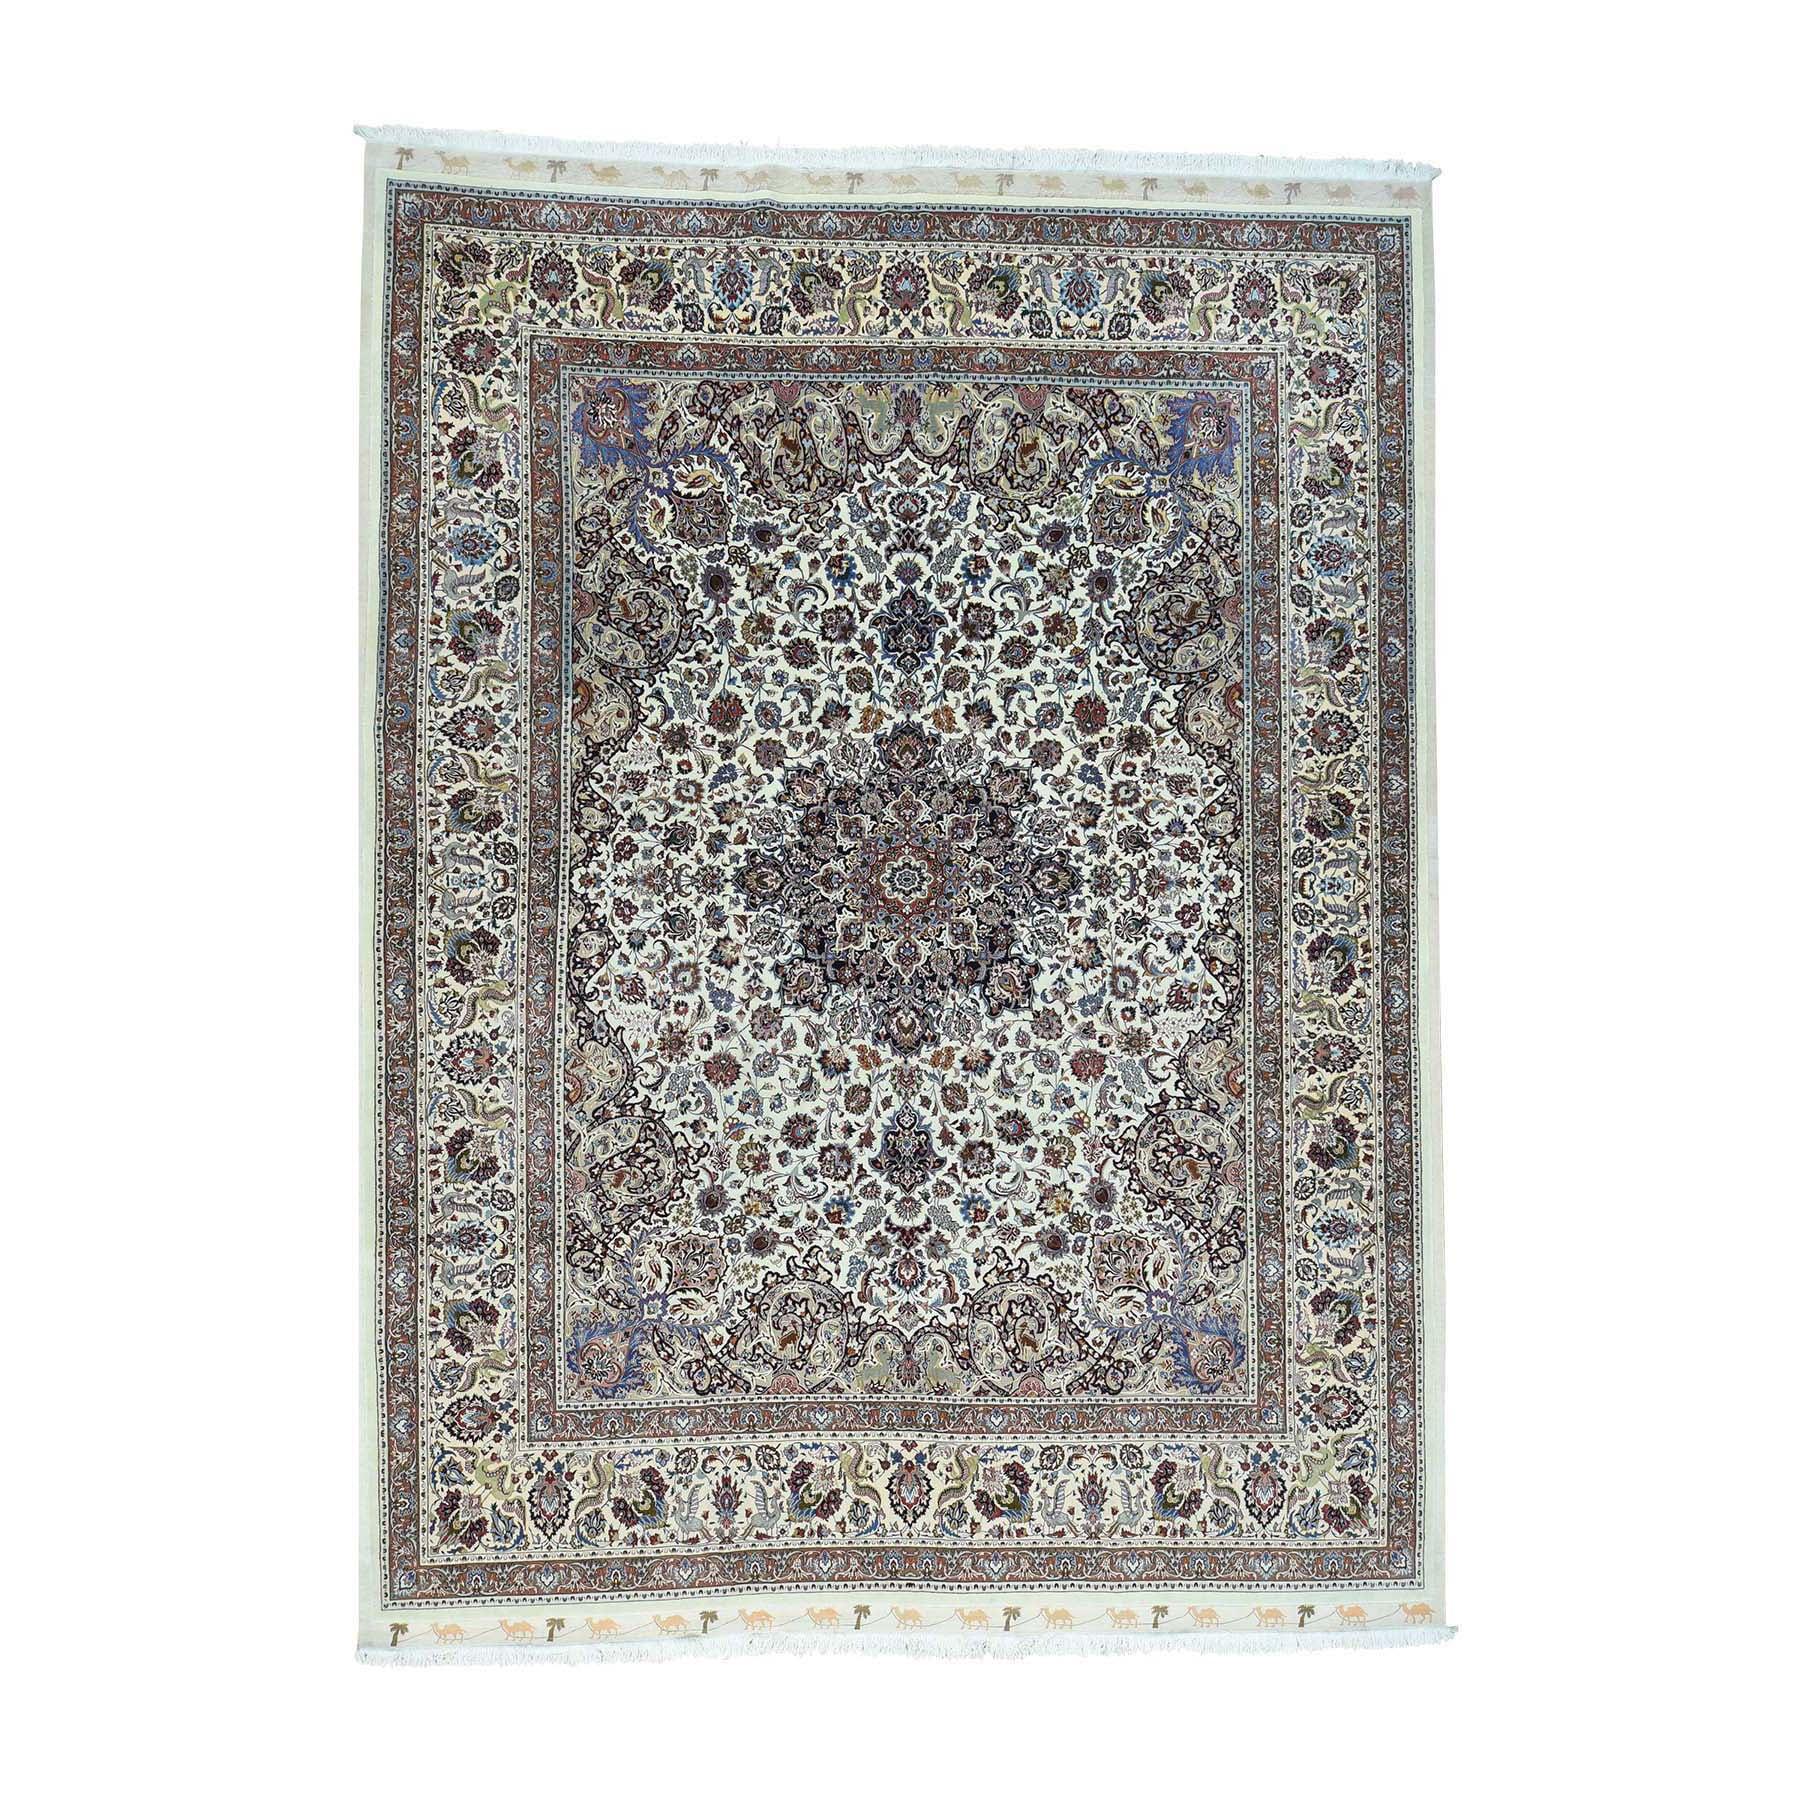 Shahbanu Rugs Hand-Knotted Persian Mashad Saberi Wool And Silk 400 Kpsi Rug (10'0x13'8)